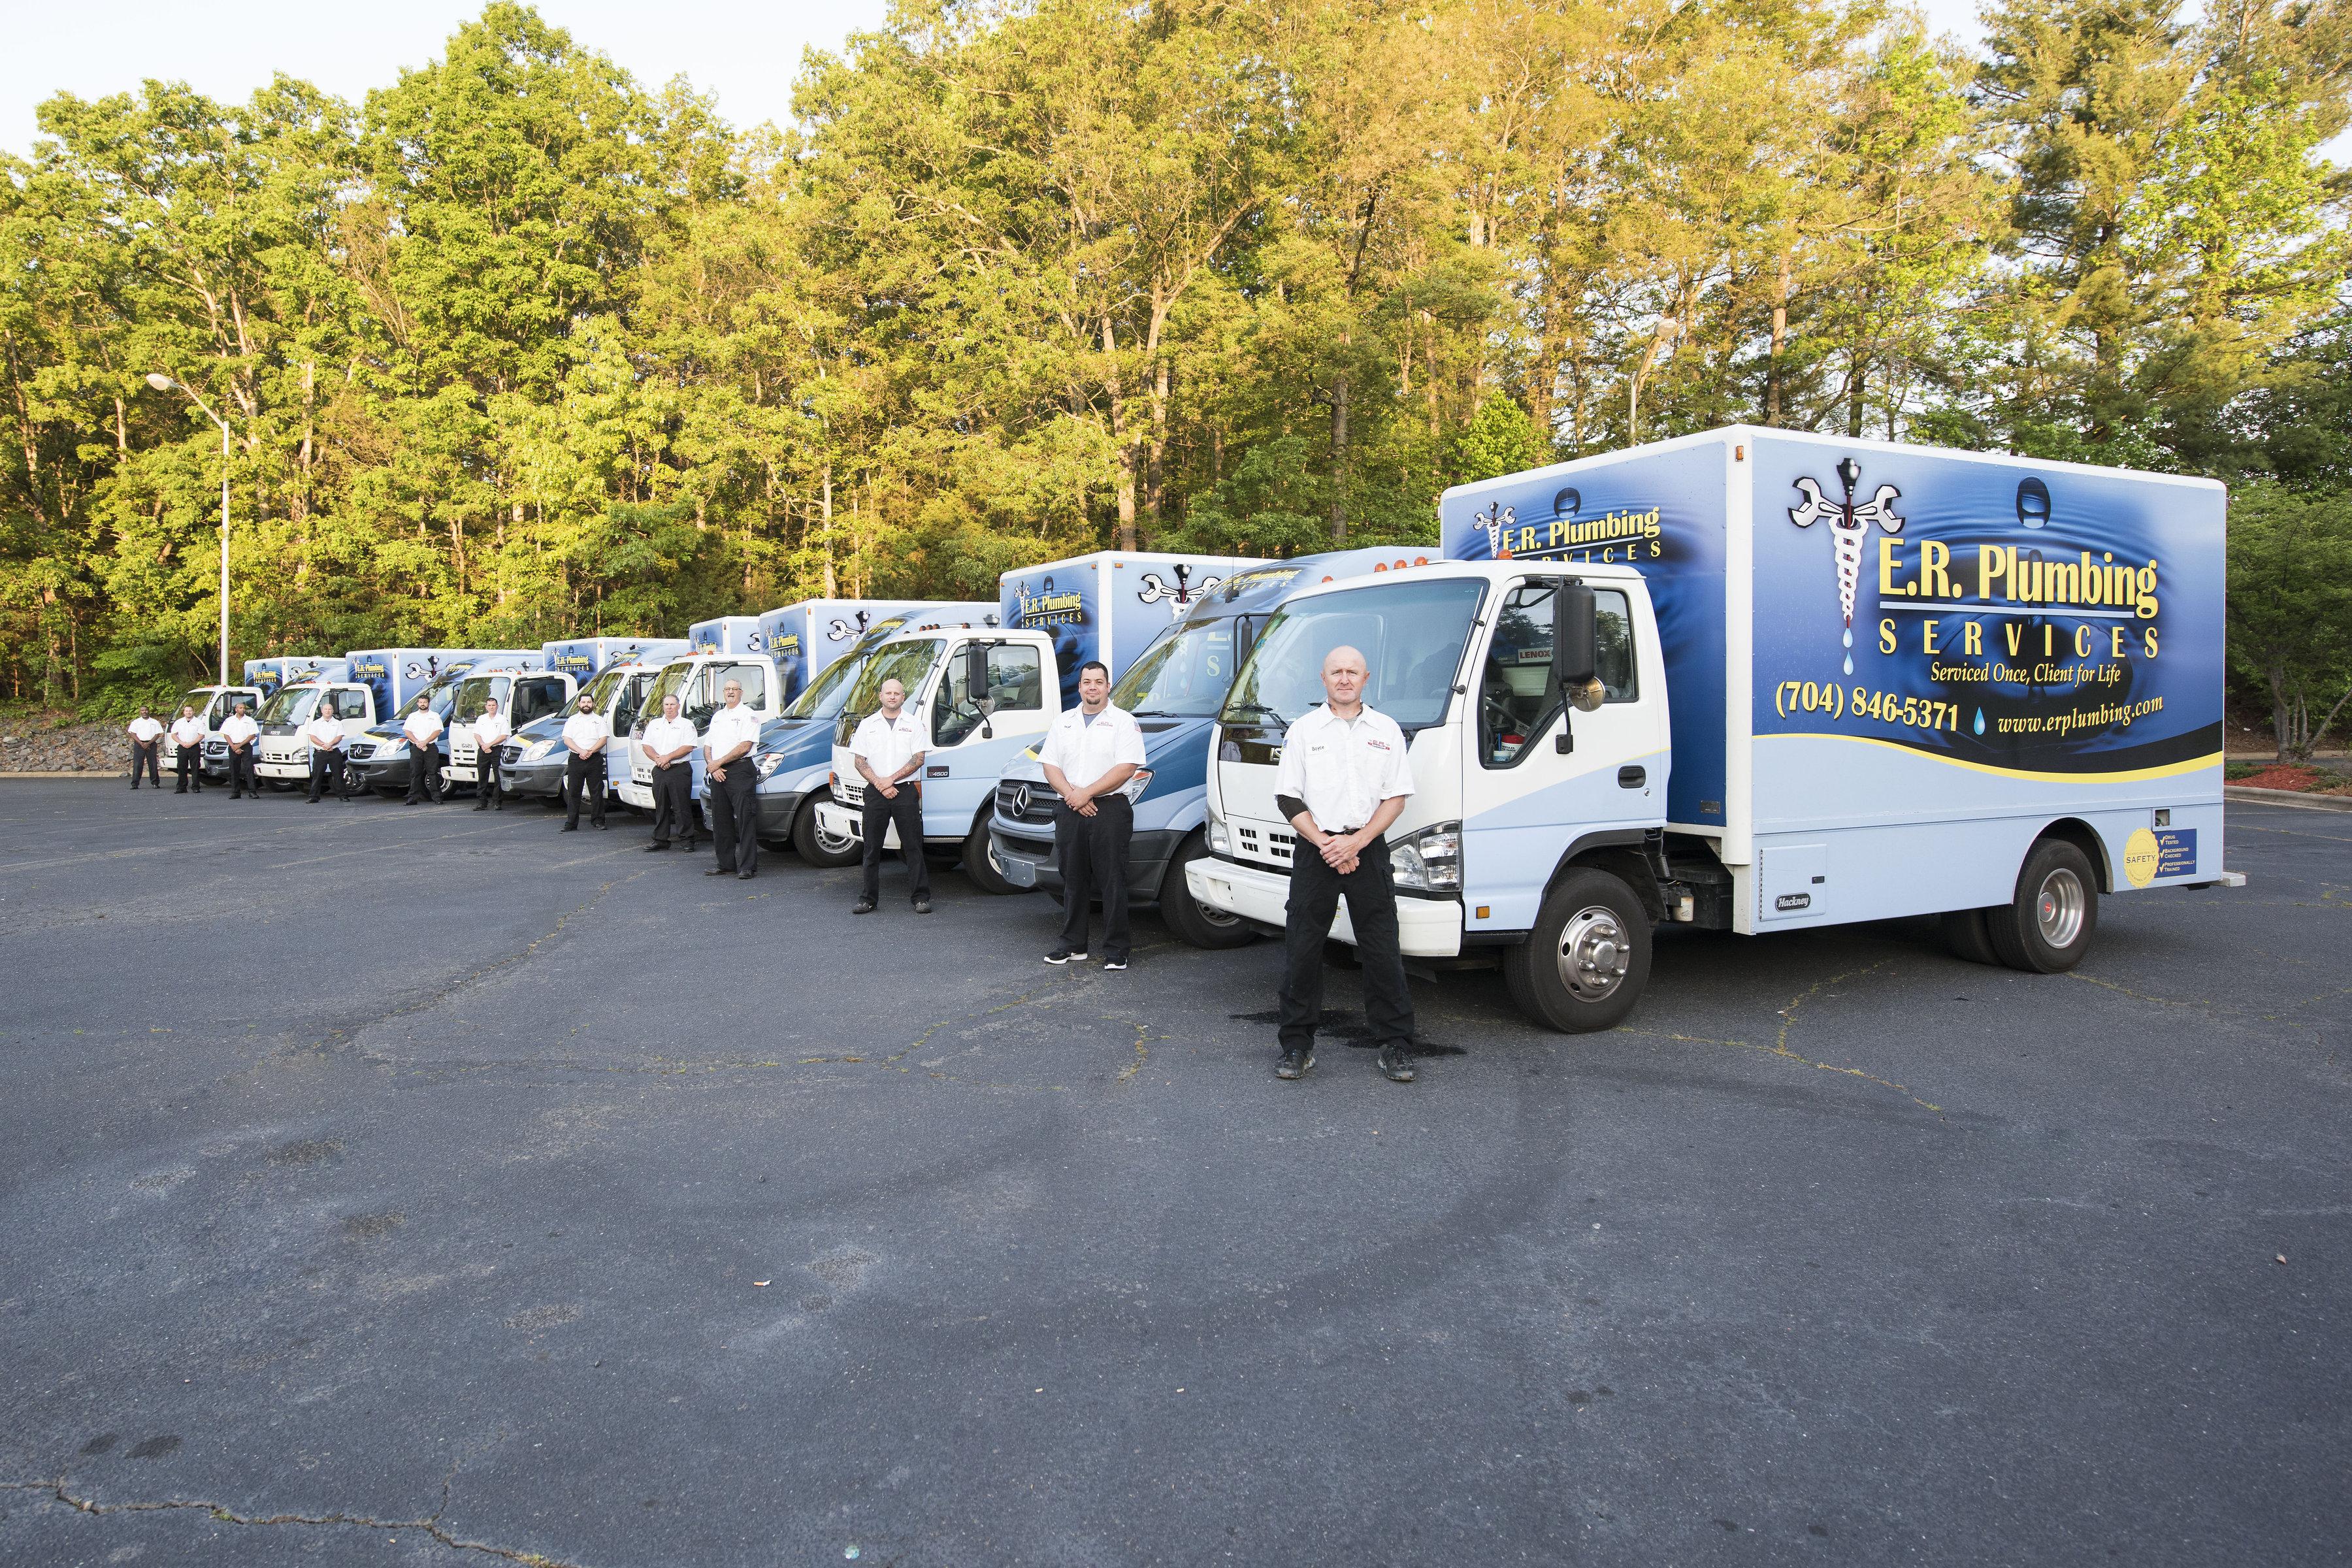 Charlotte hot water heaters, plumber Charlotte, plumbers Charlotte nc